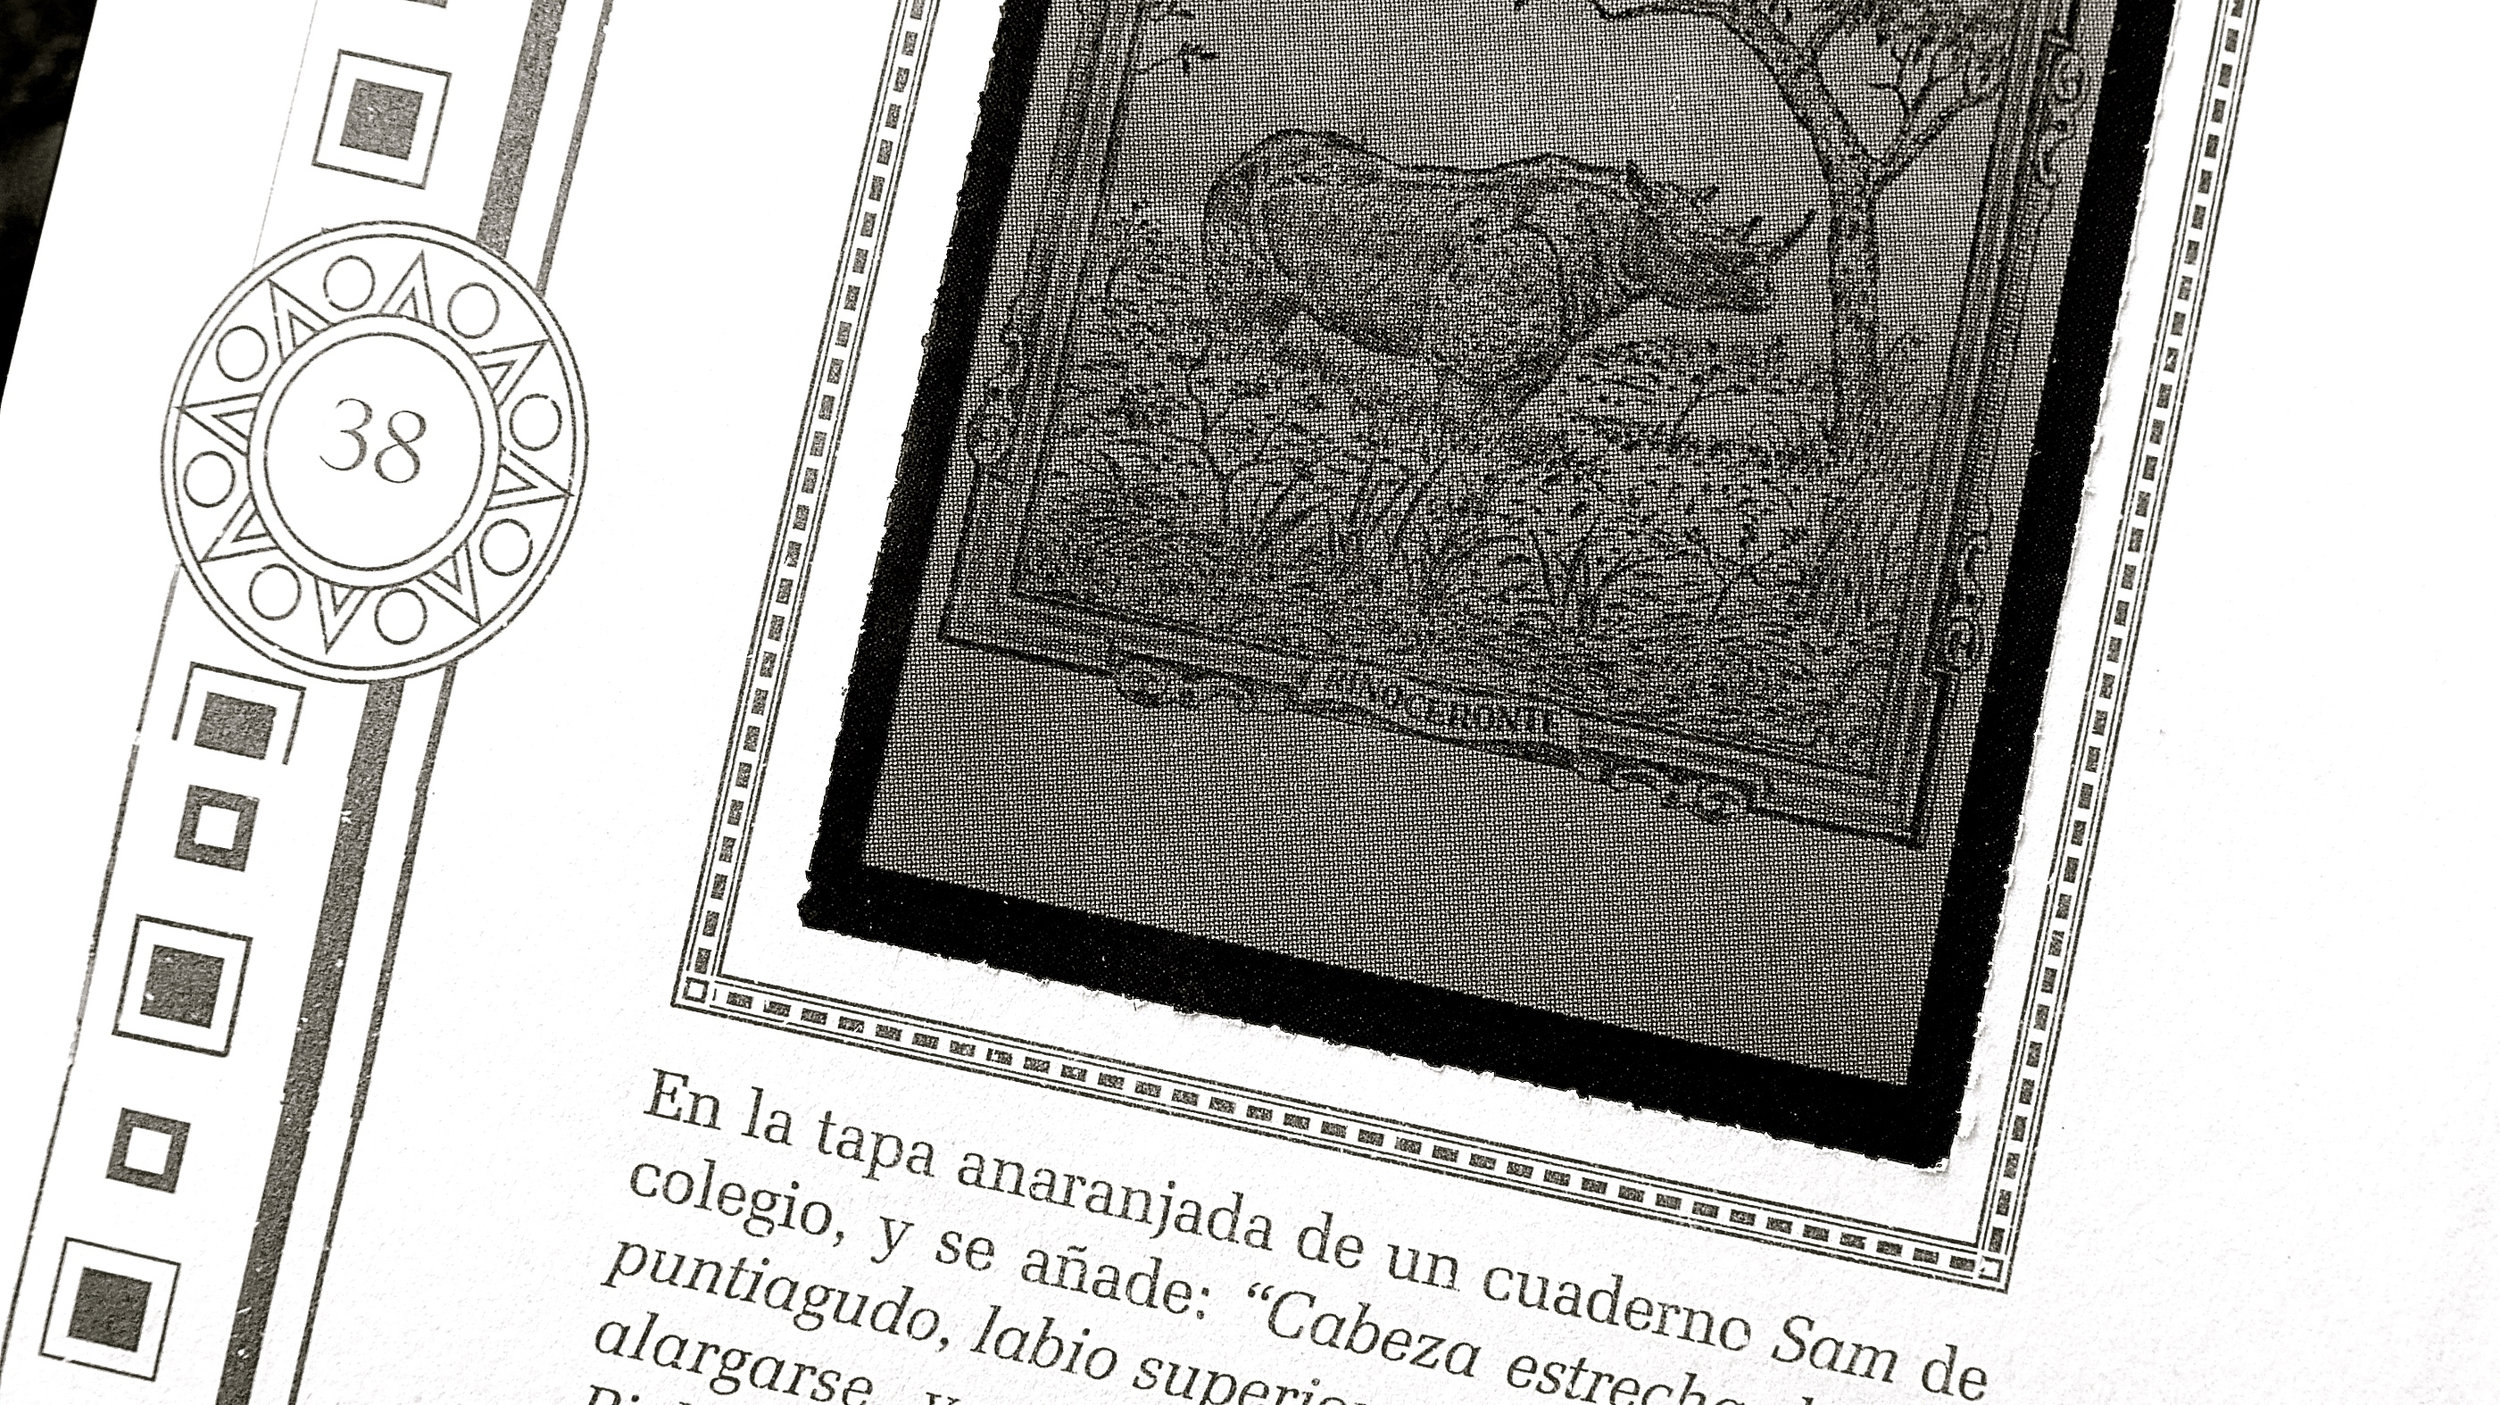 Rinoceronte cuaderno SAM